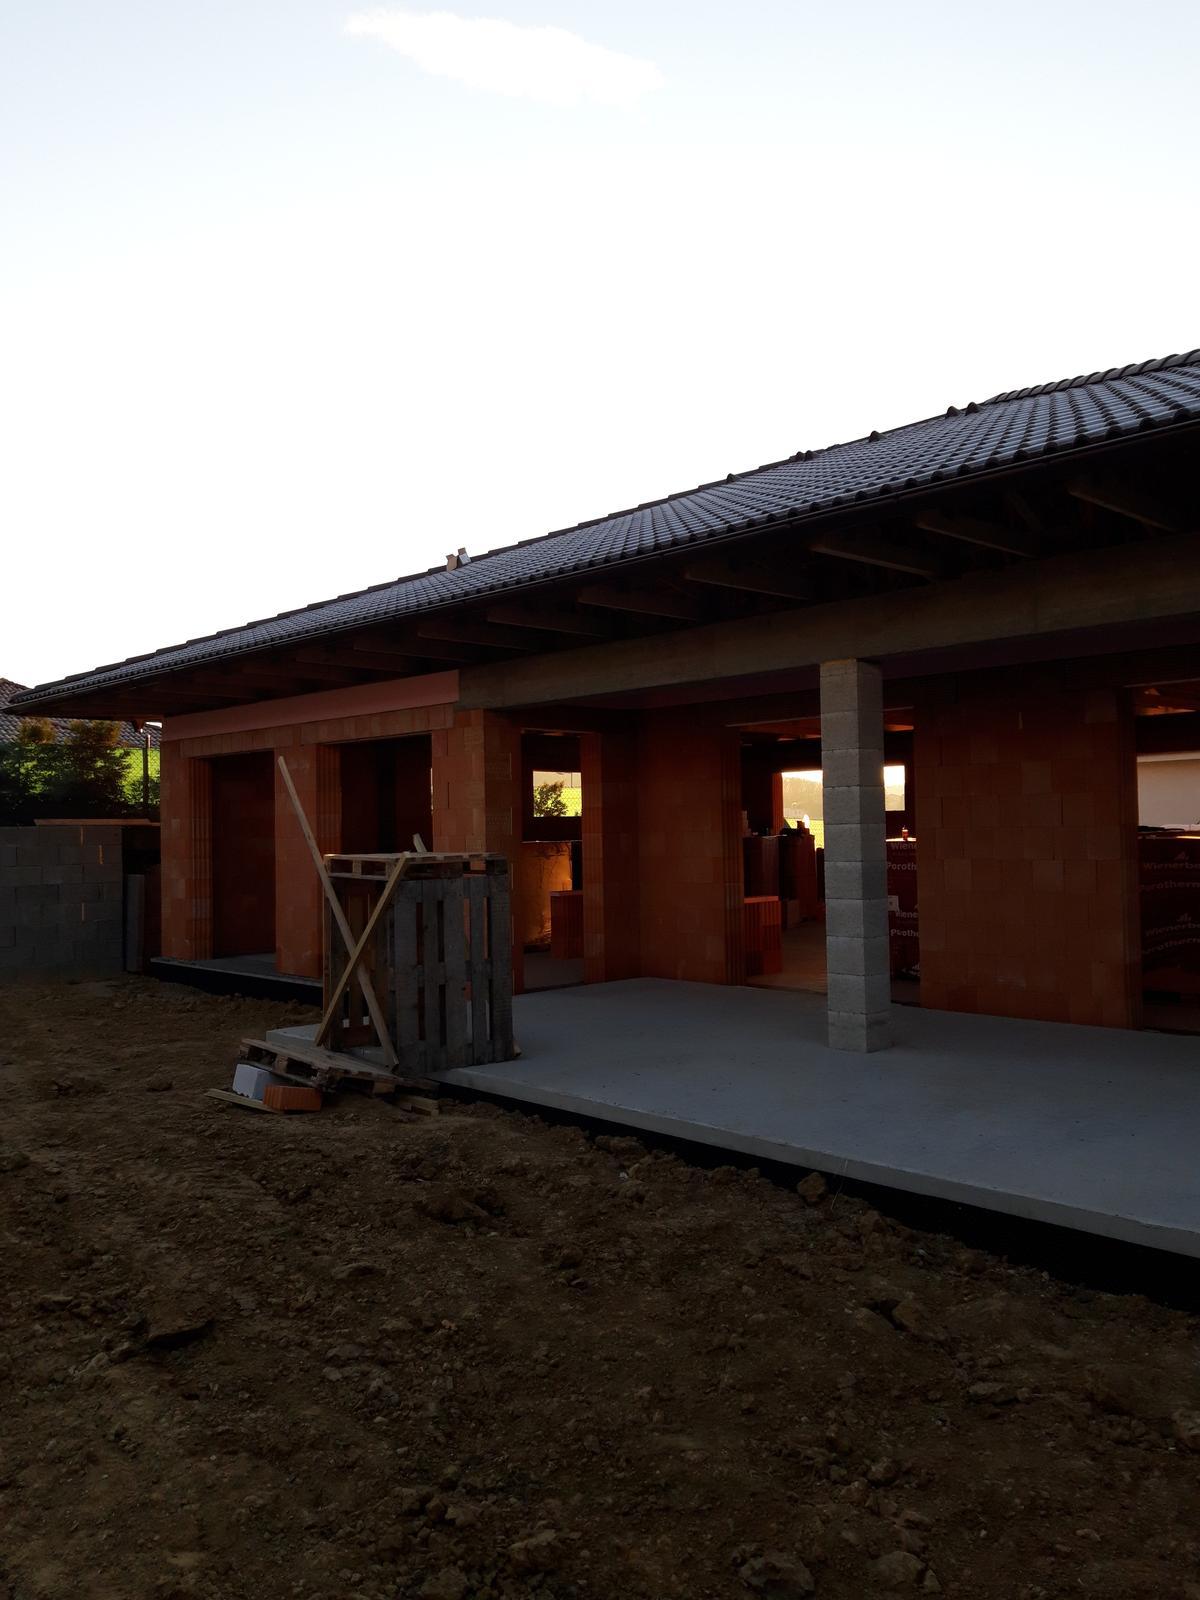 matusakrobert - Hrubá stavba bungalovu v Malom Lapáši pri Nitre.